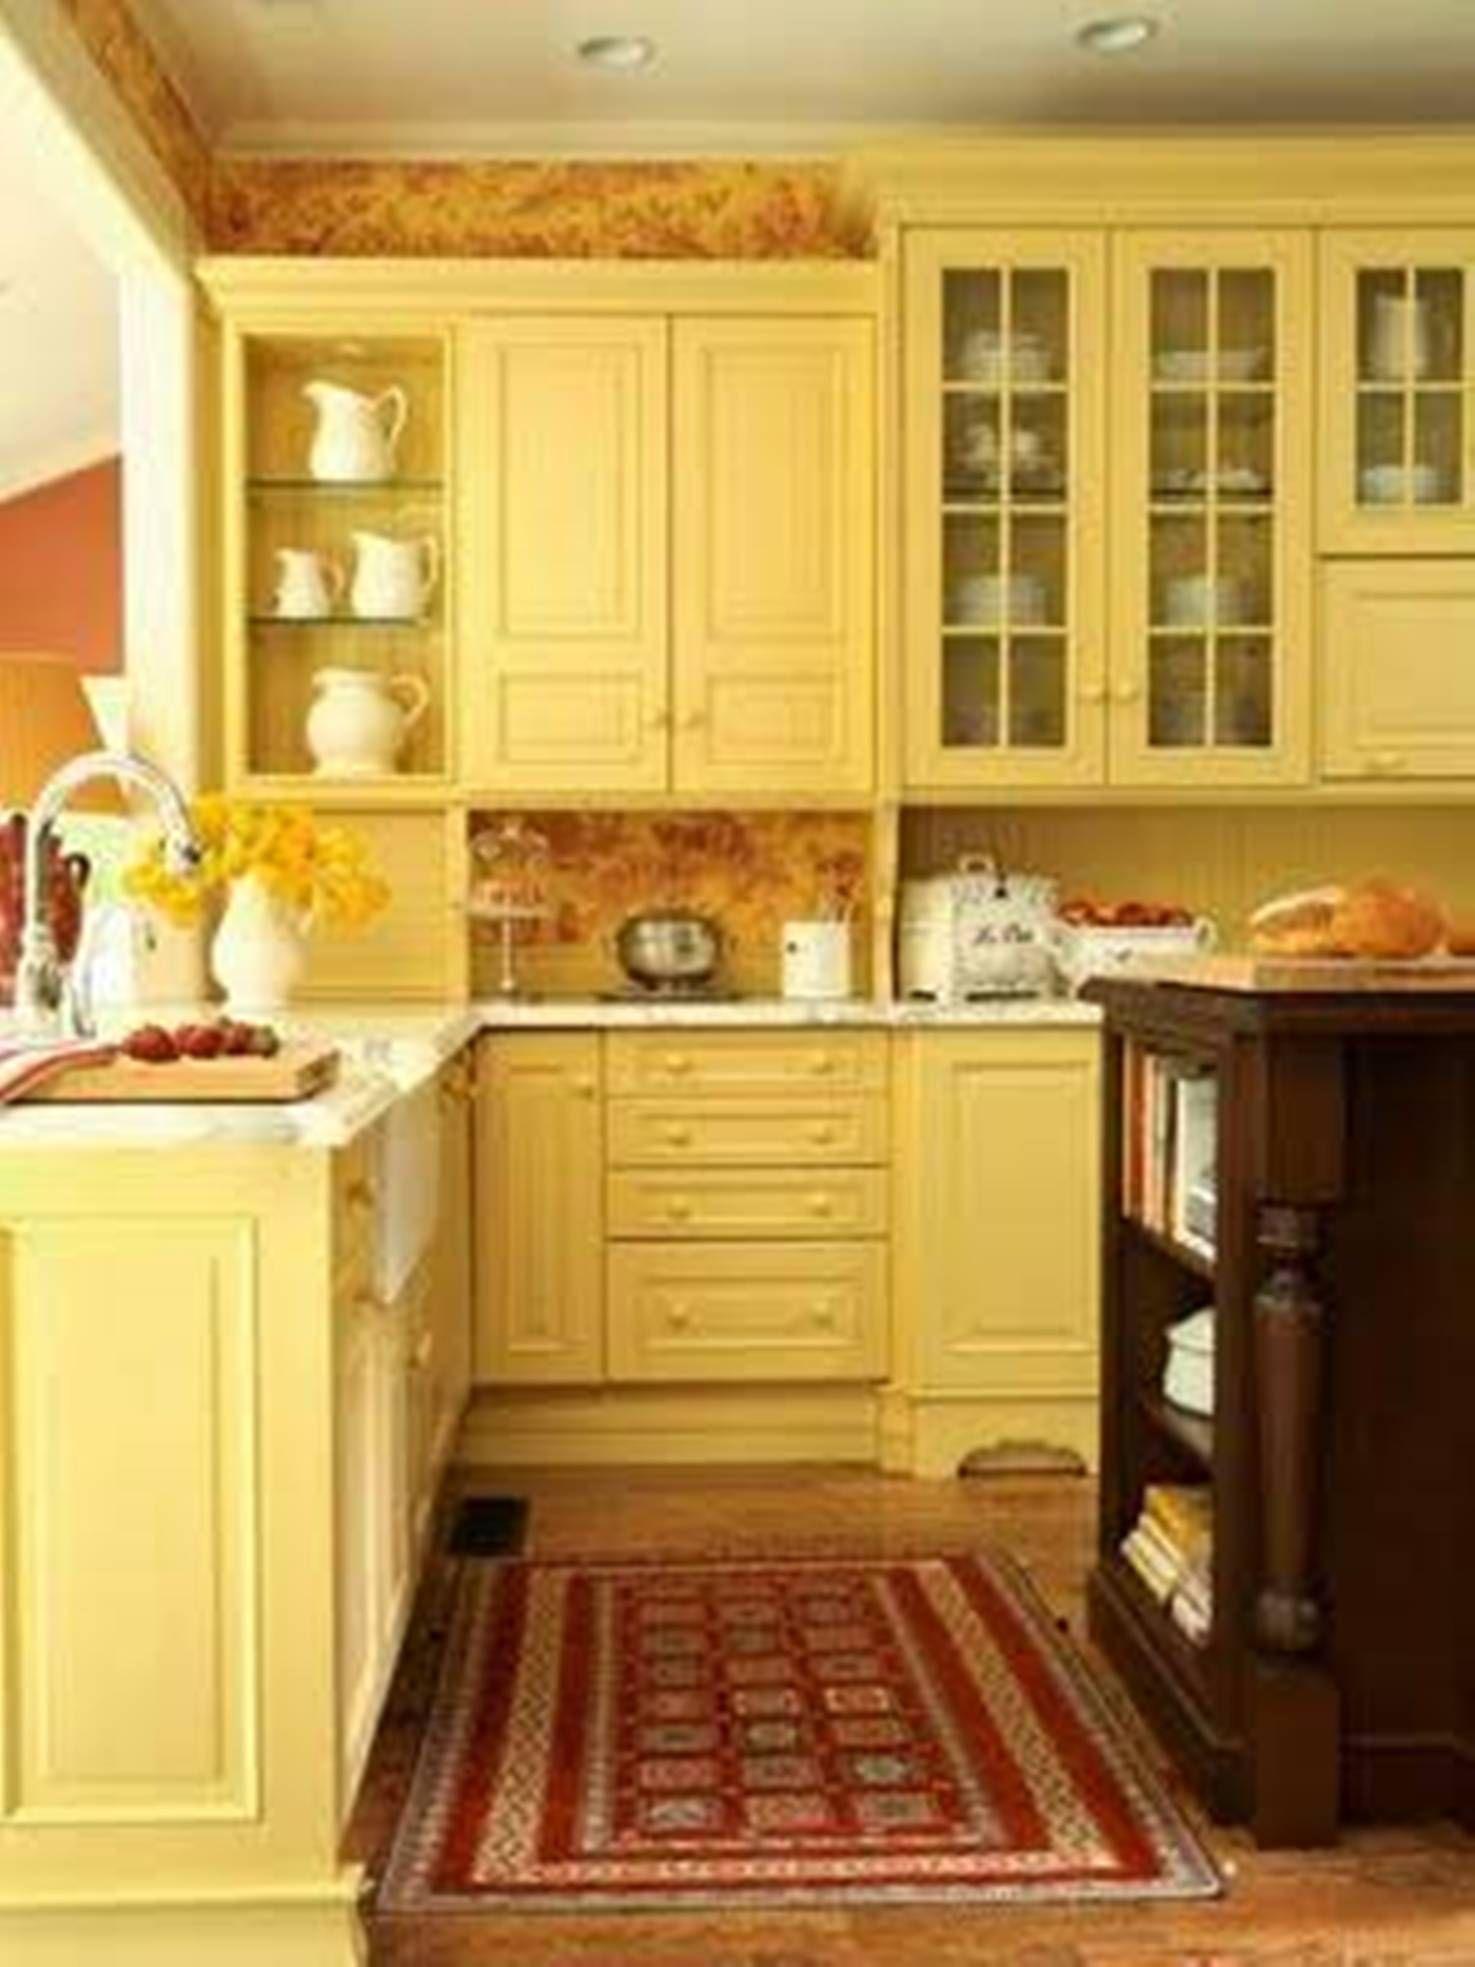 kitchen yellow kitchen walls viewing gallery yellow kitchen design pretty yellow kitchens on kitchen yellow id=56646